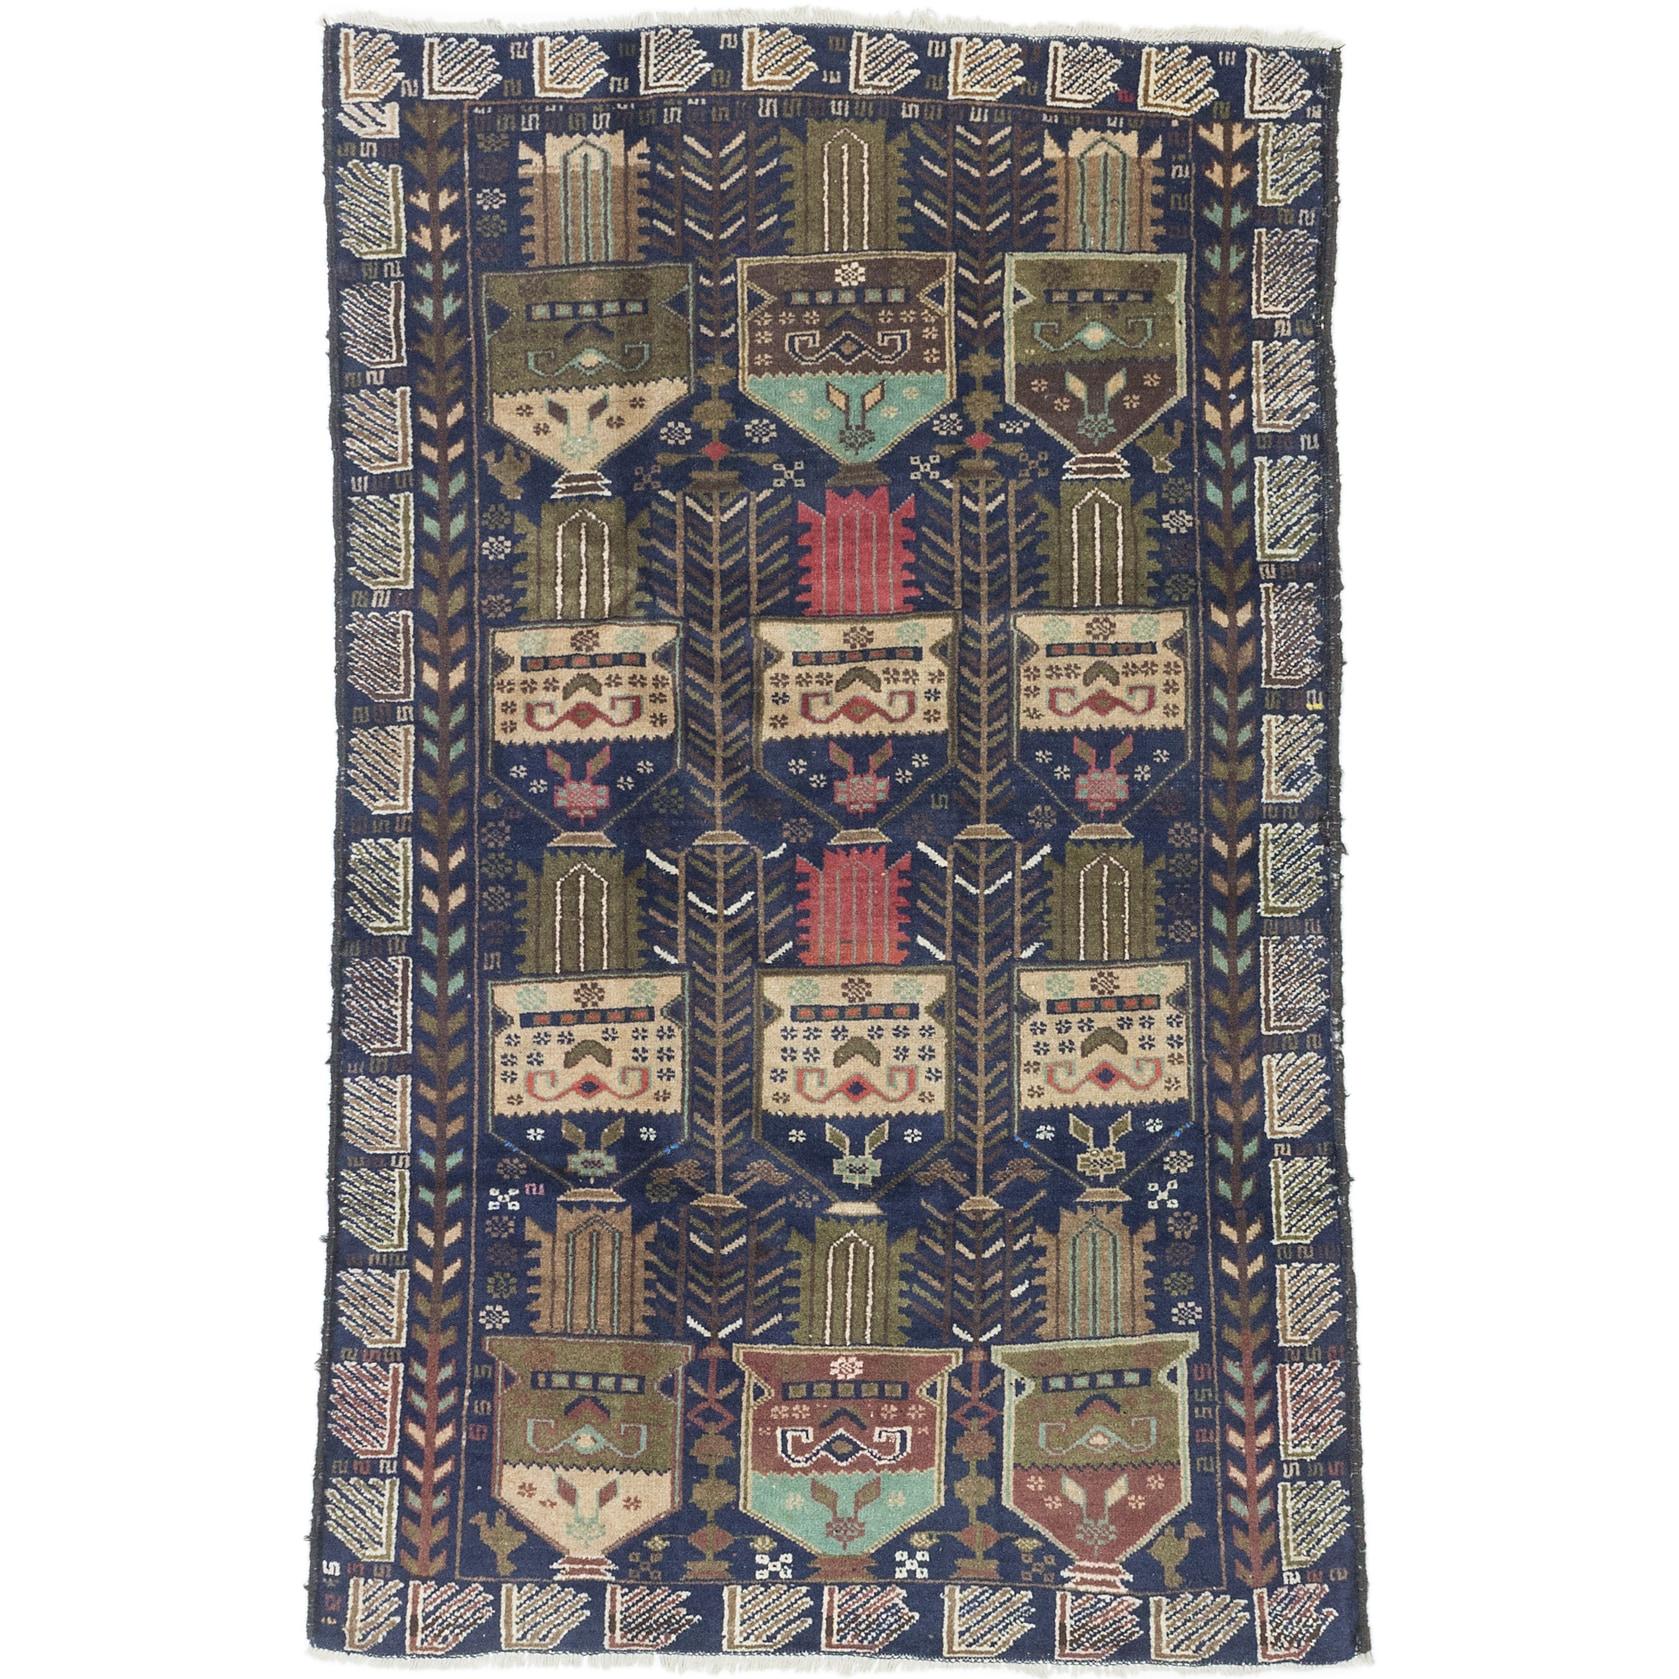 Shop ecarpetgallery Tora Bora Blue Wool Rug (3'8 x 5'9) - Free Shipping Today - Overstock - 11037620